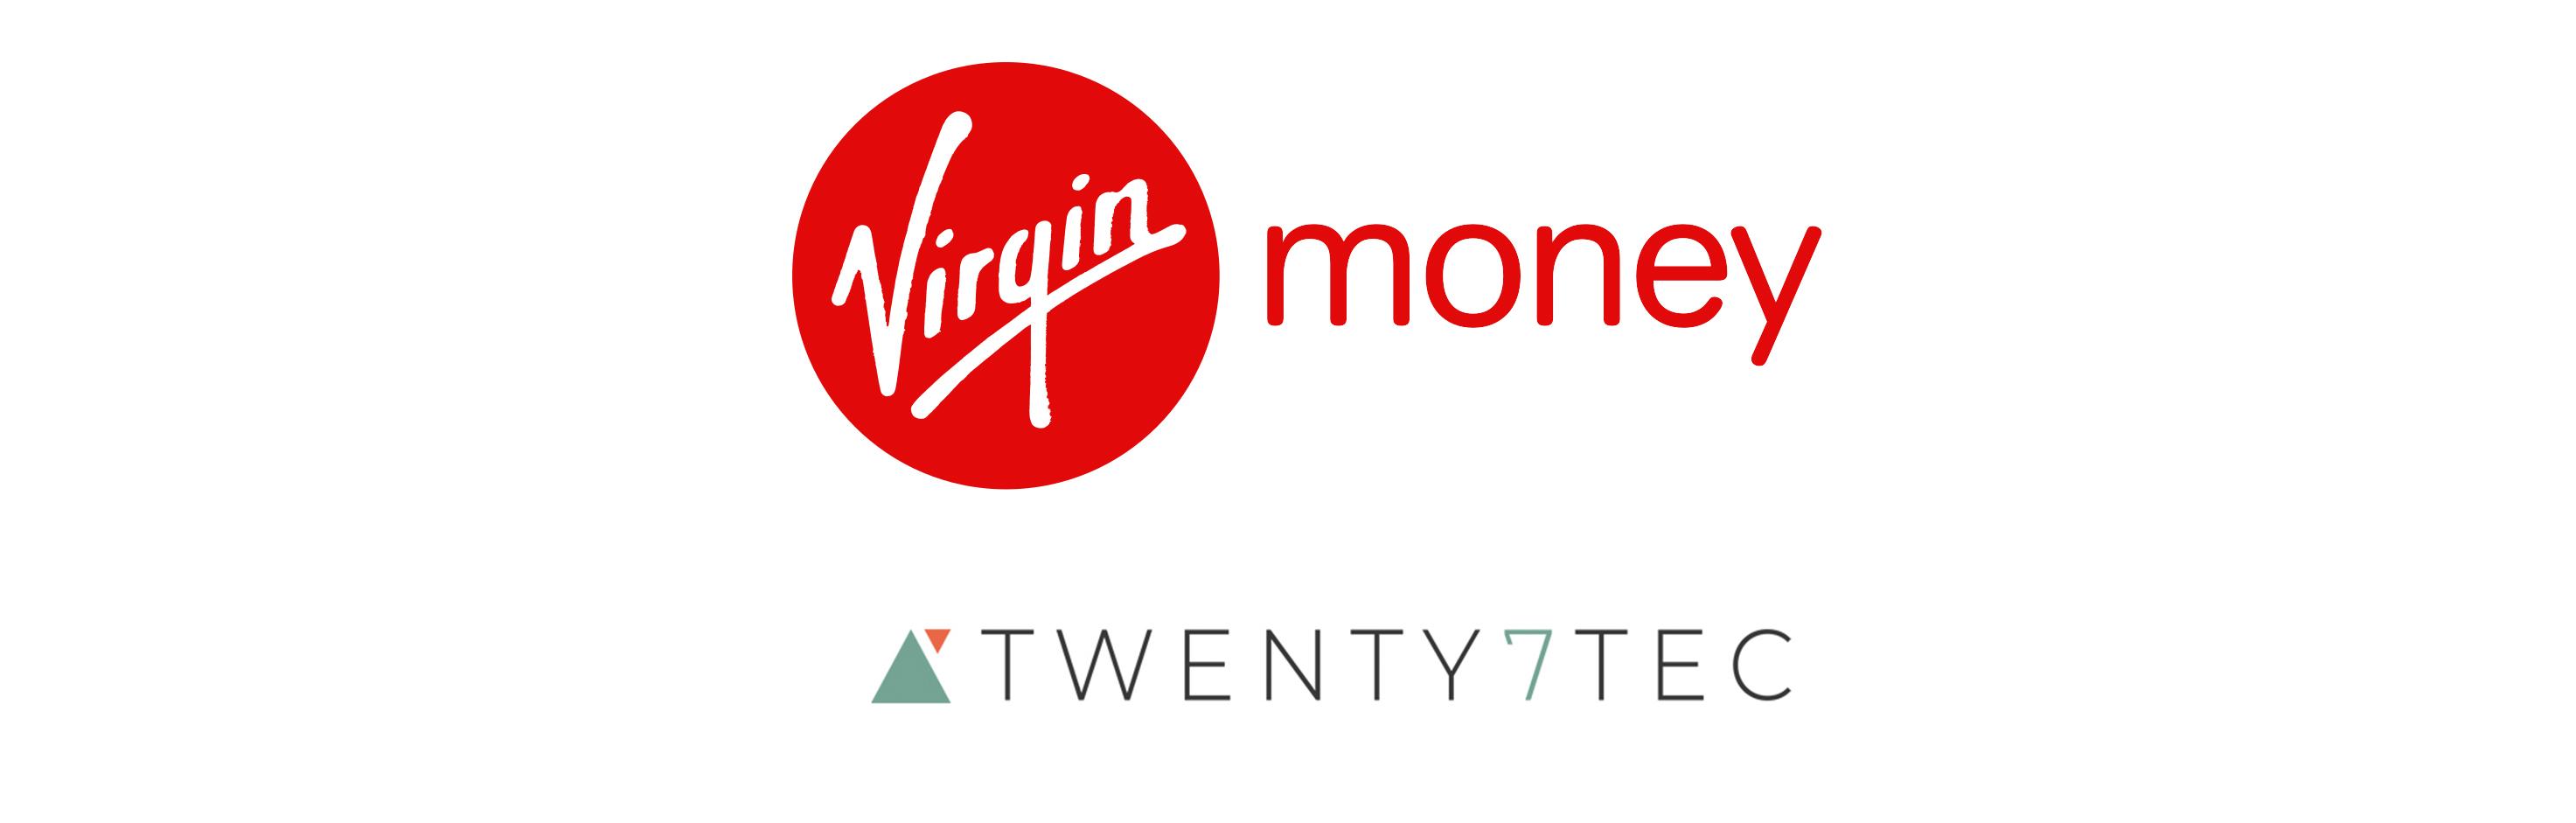 Virgin Money Launches Innovative Partnership With Twenty7Tec